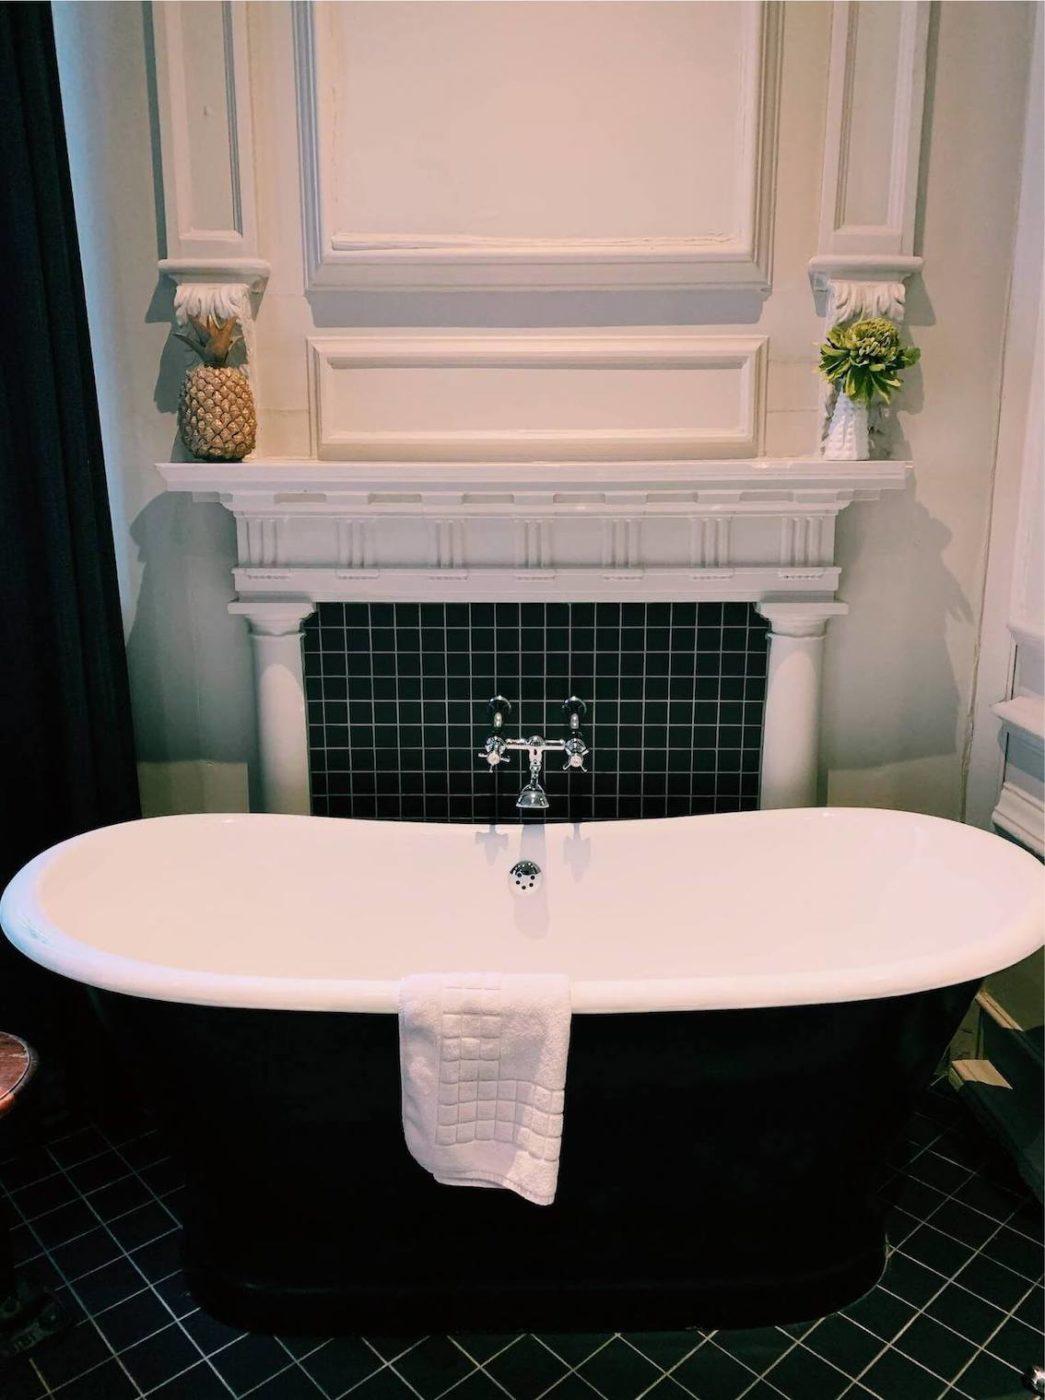 freestanding bathtub in bedroom of the Judges Court Hotel